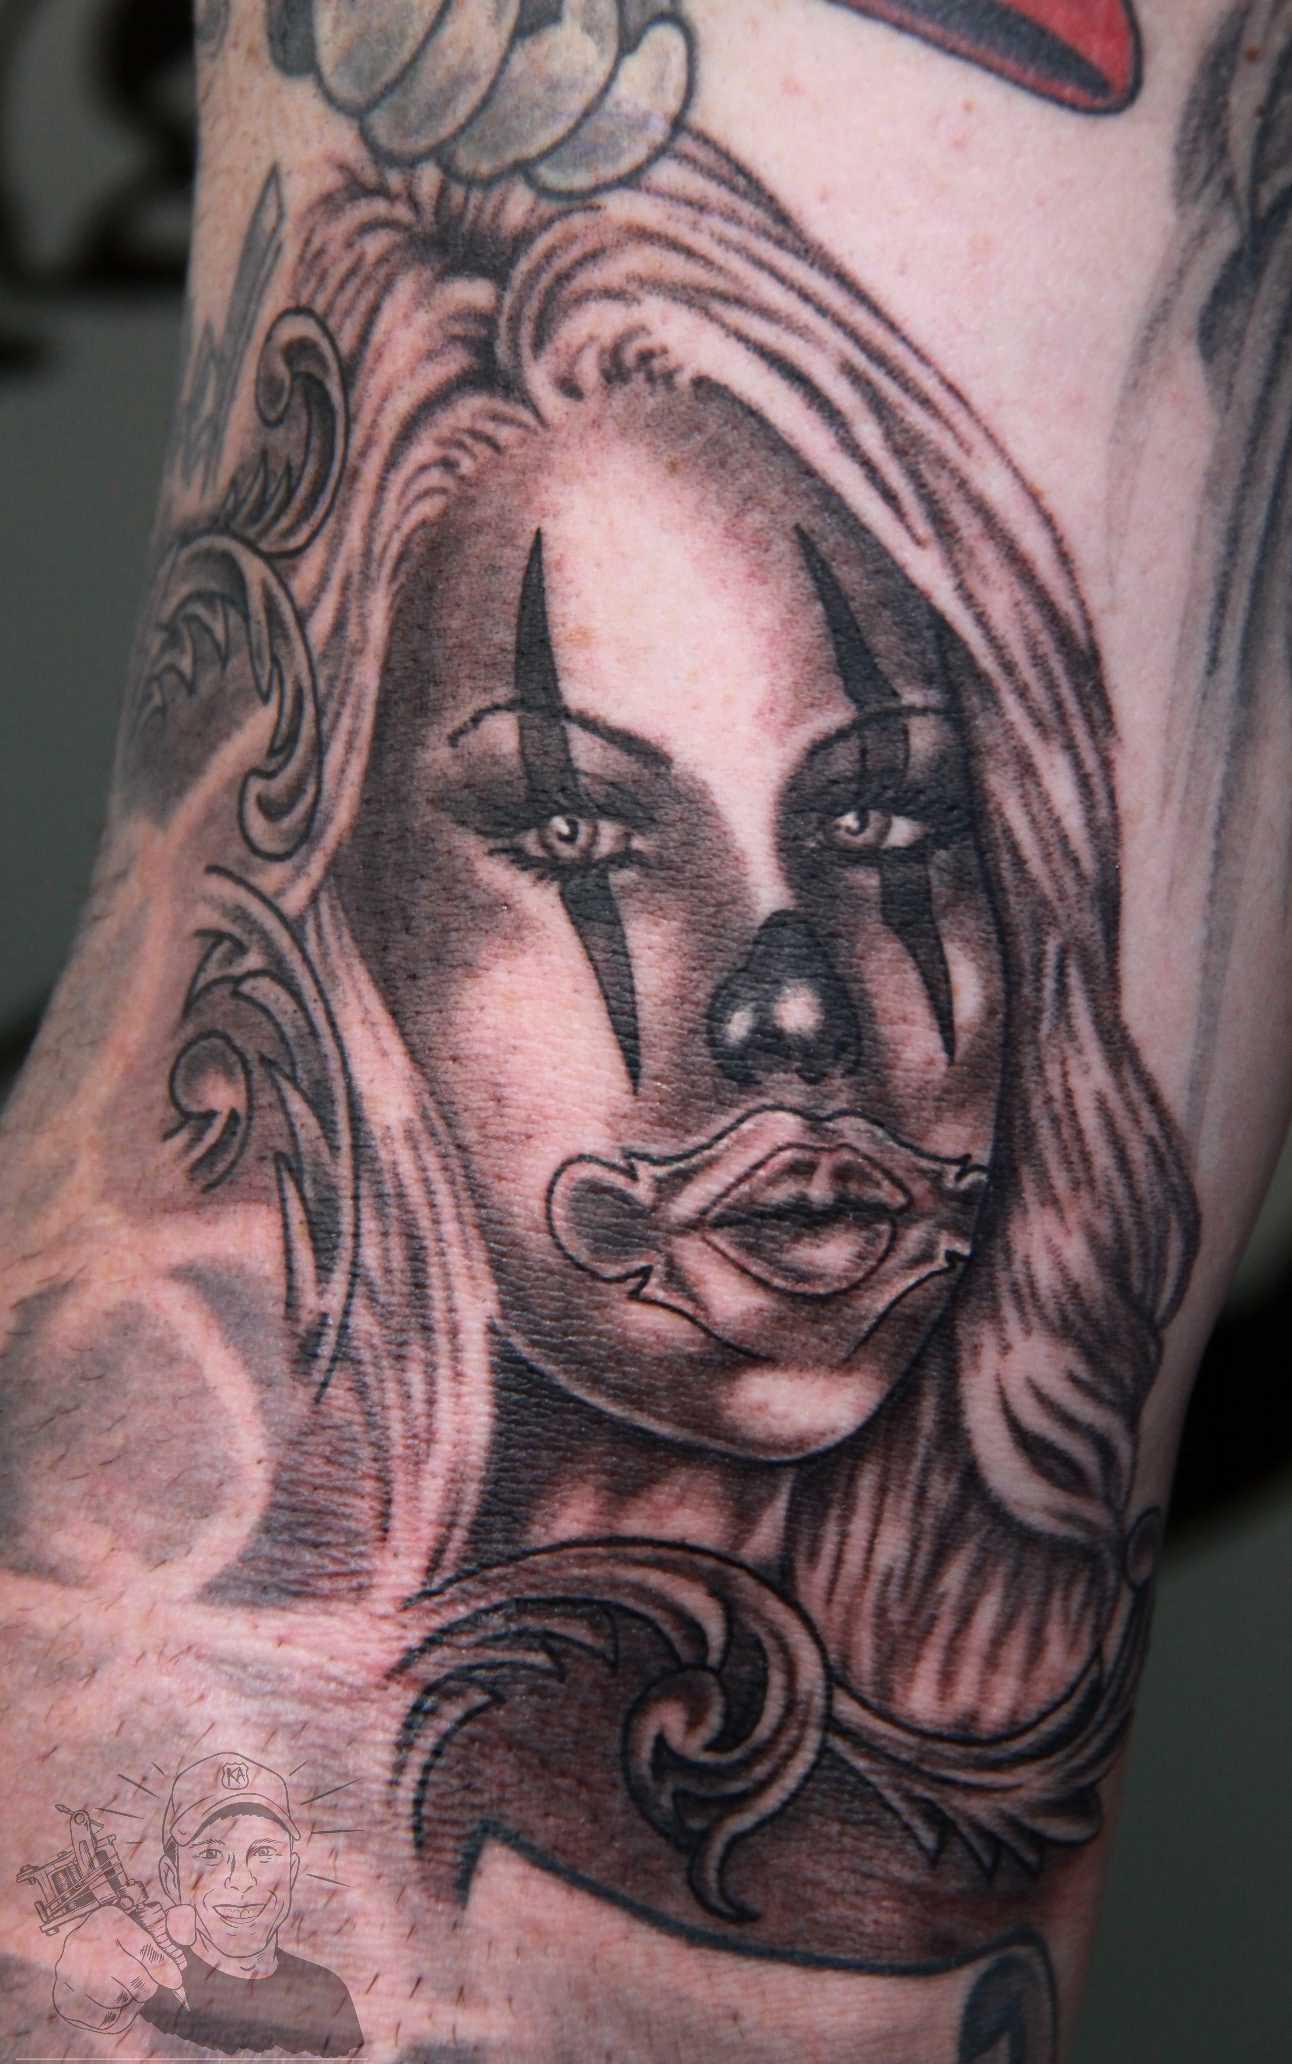 Clown girl tattoo design for Chicano clown girl tattoos